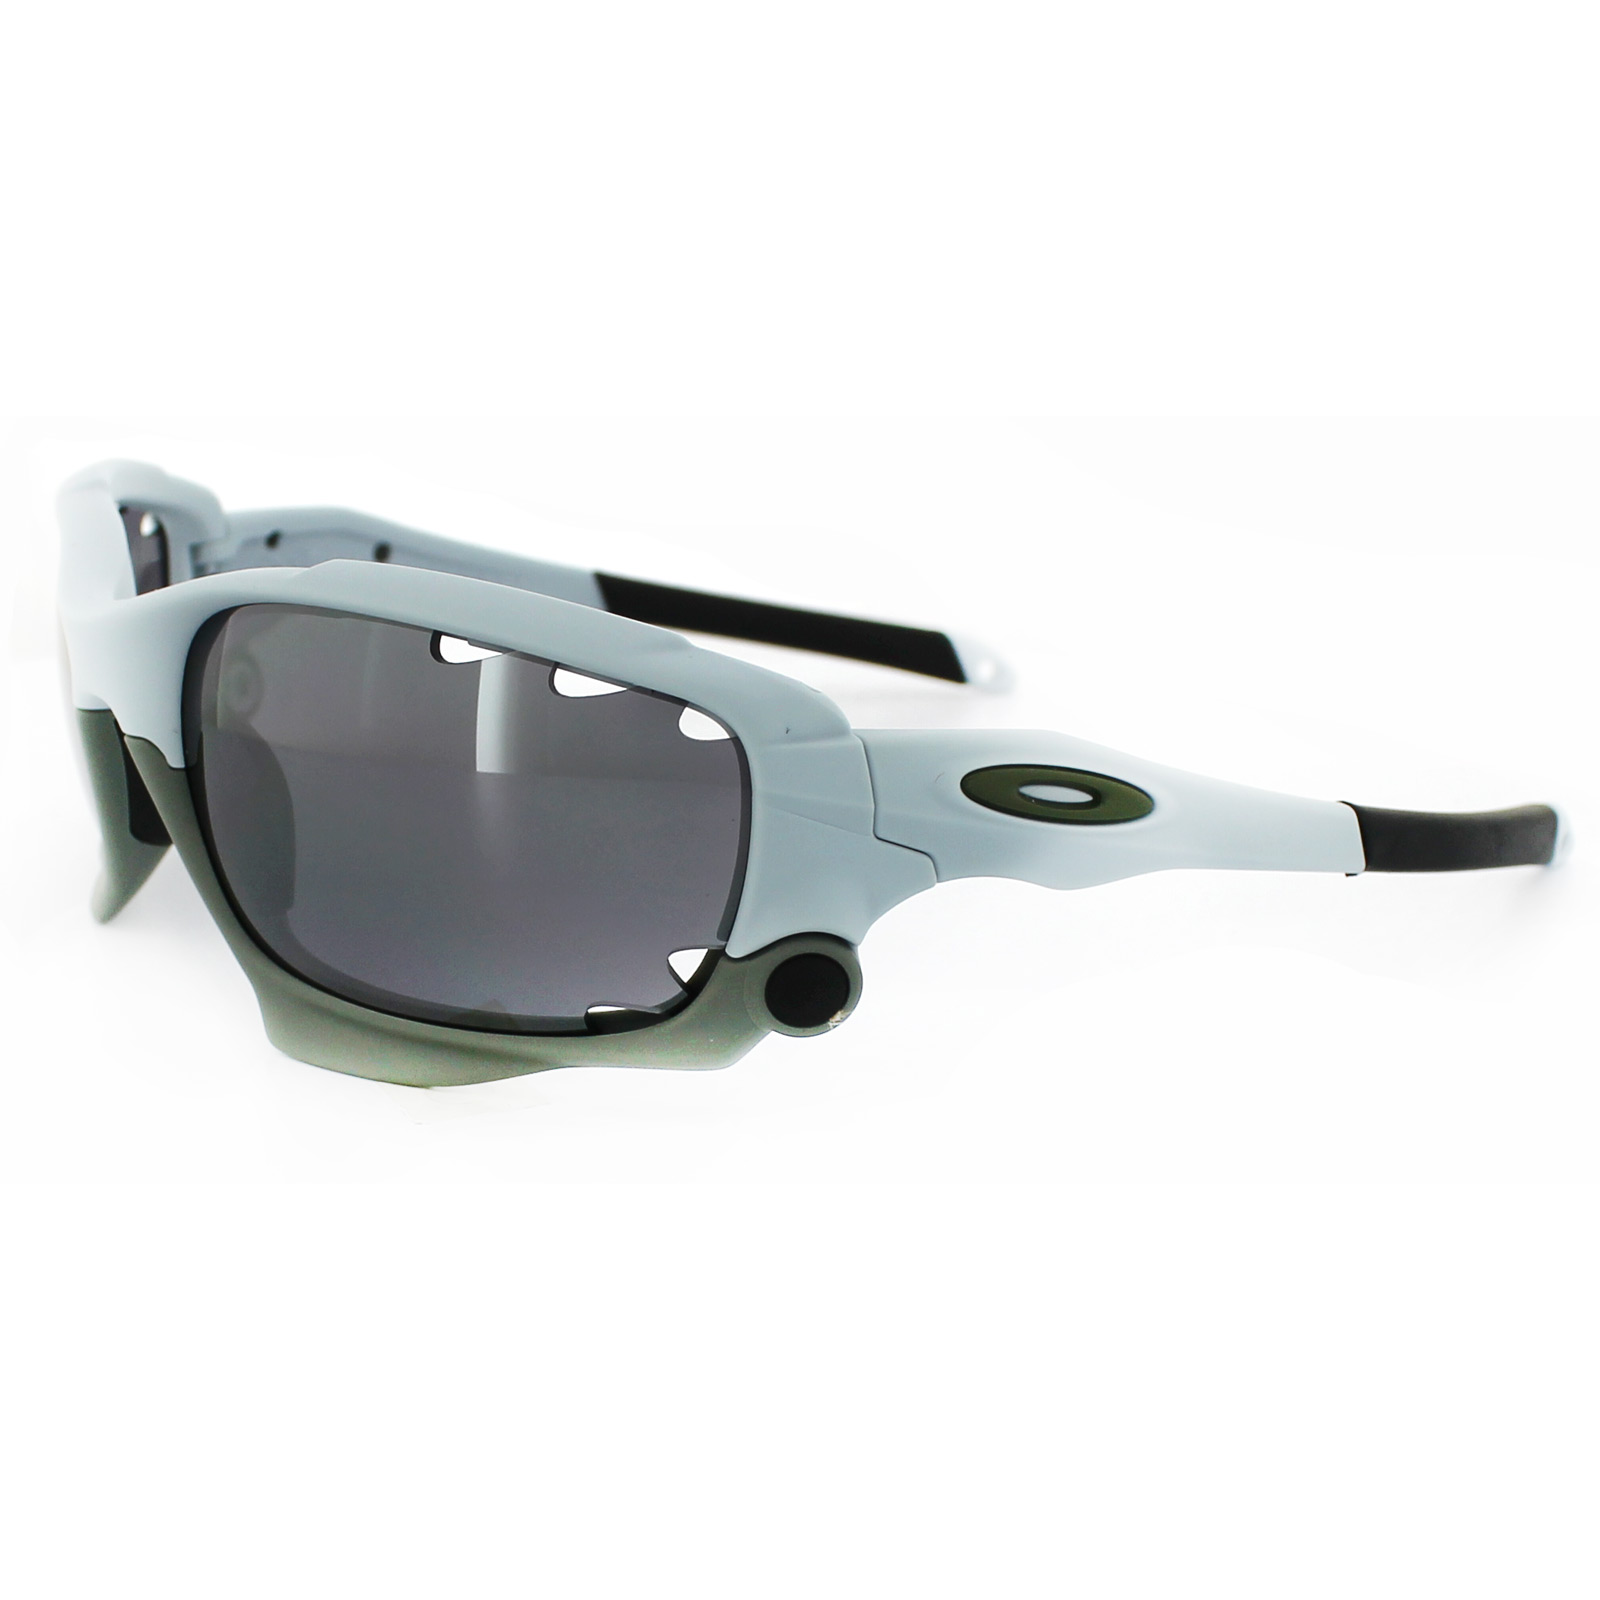 d0372aa819d Oakley Sunglasses For Driving « Heritage Malta